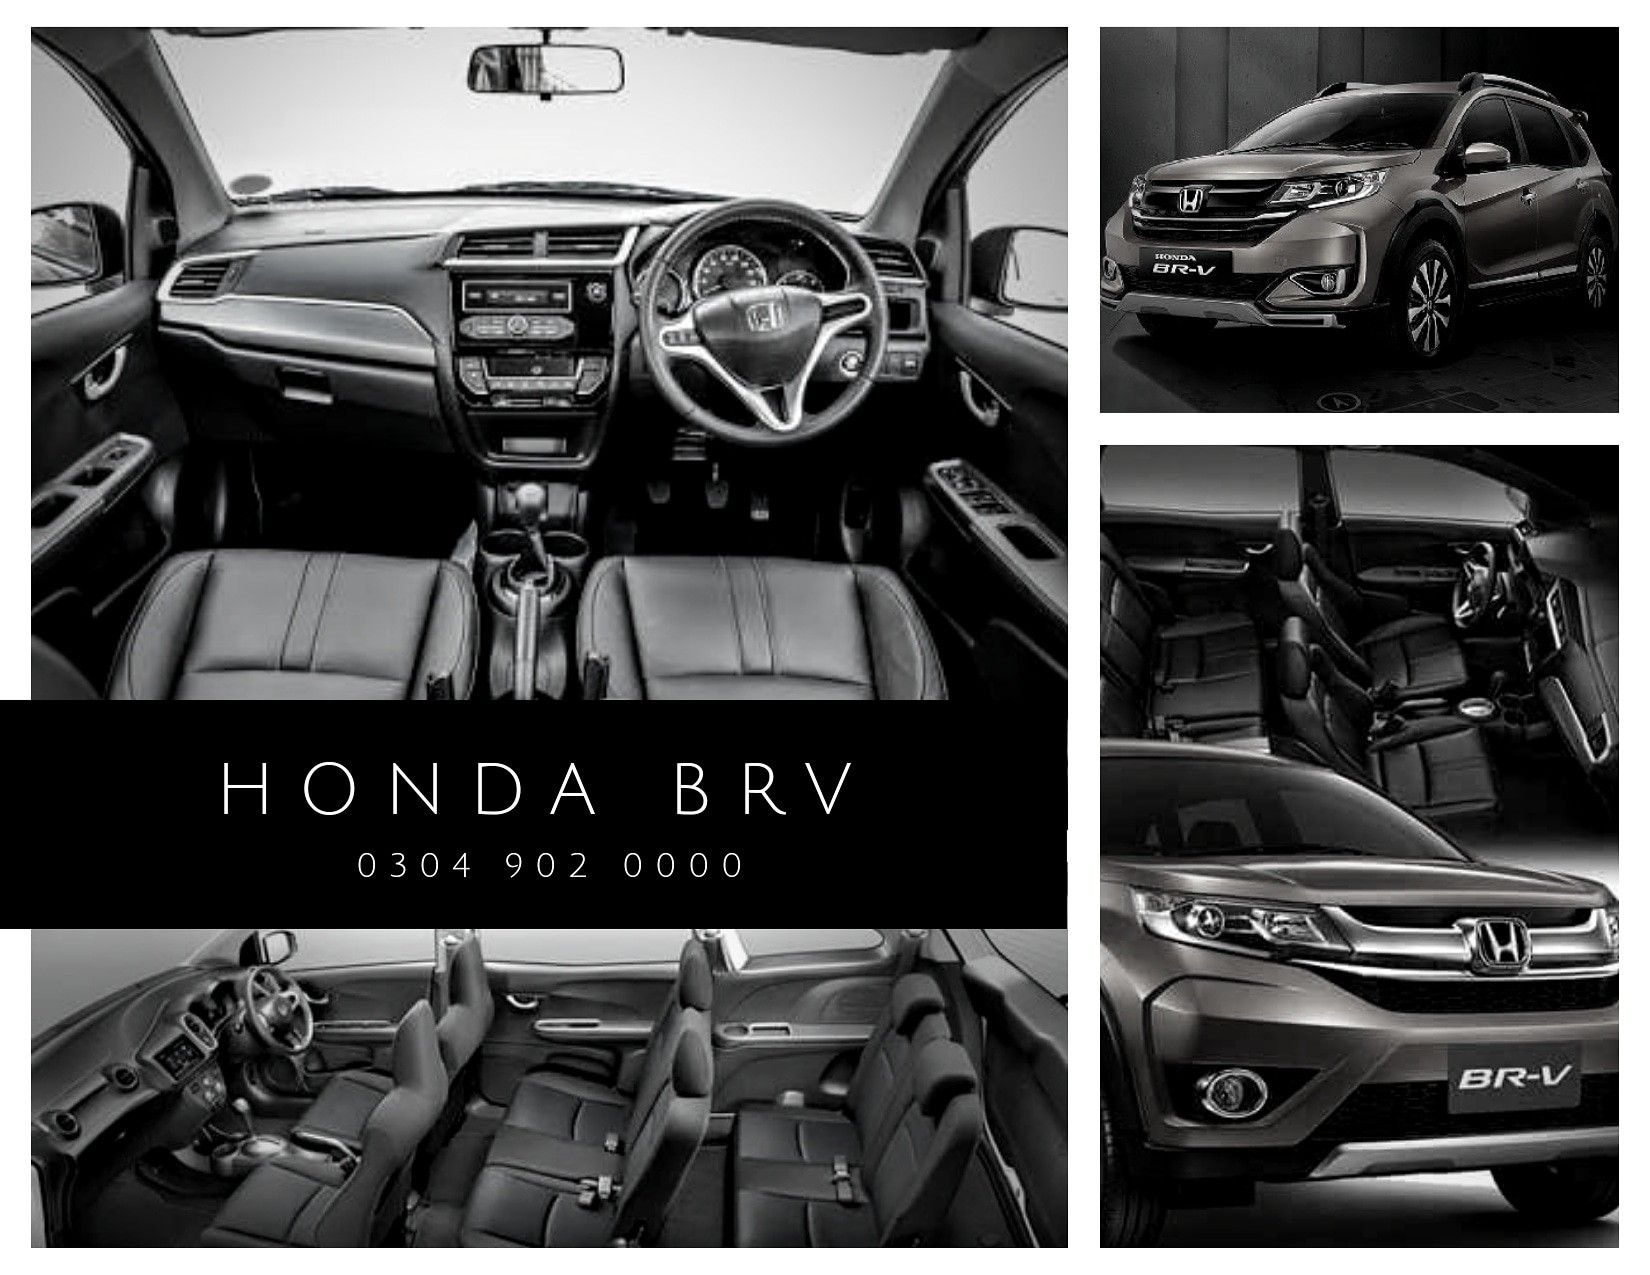 Honda Brv Car Hd Wallpaper